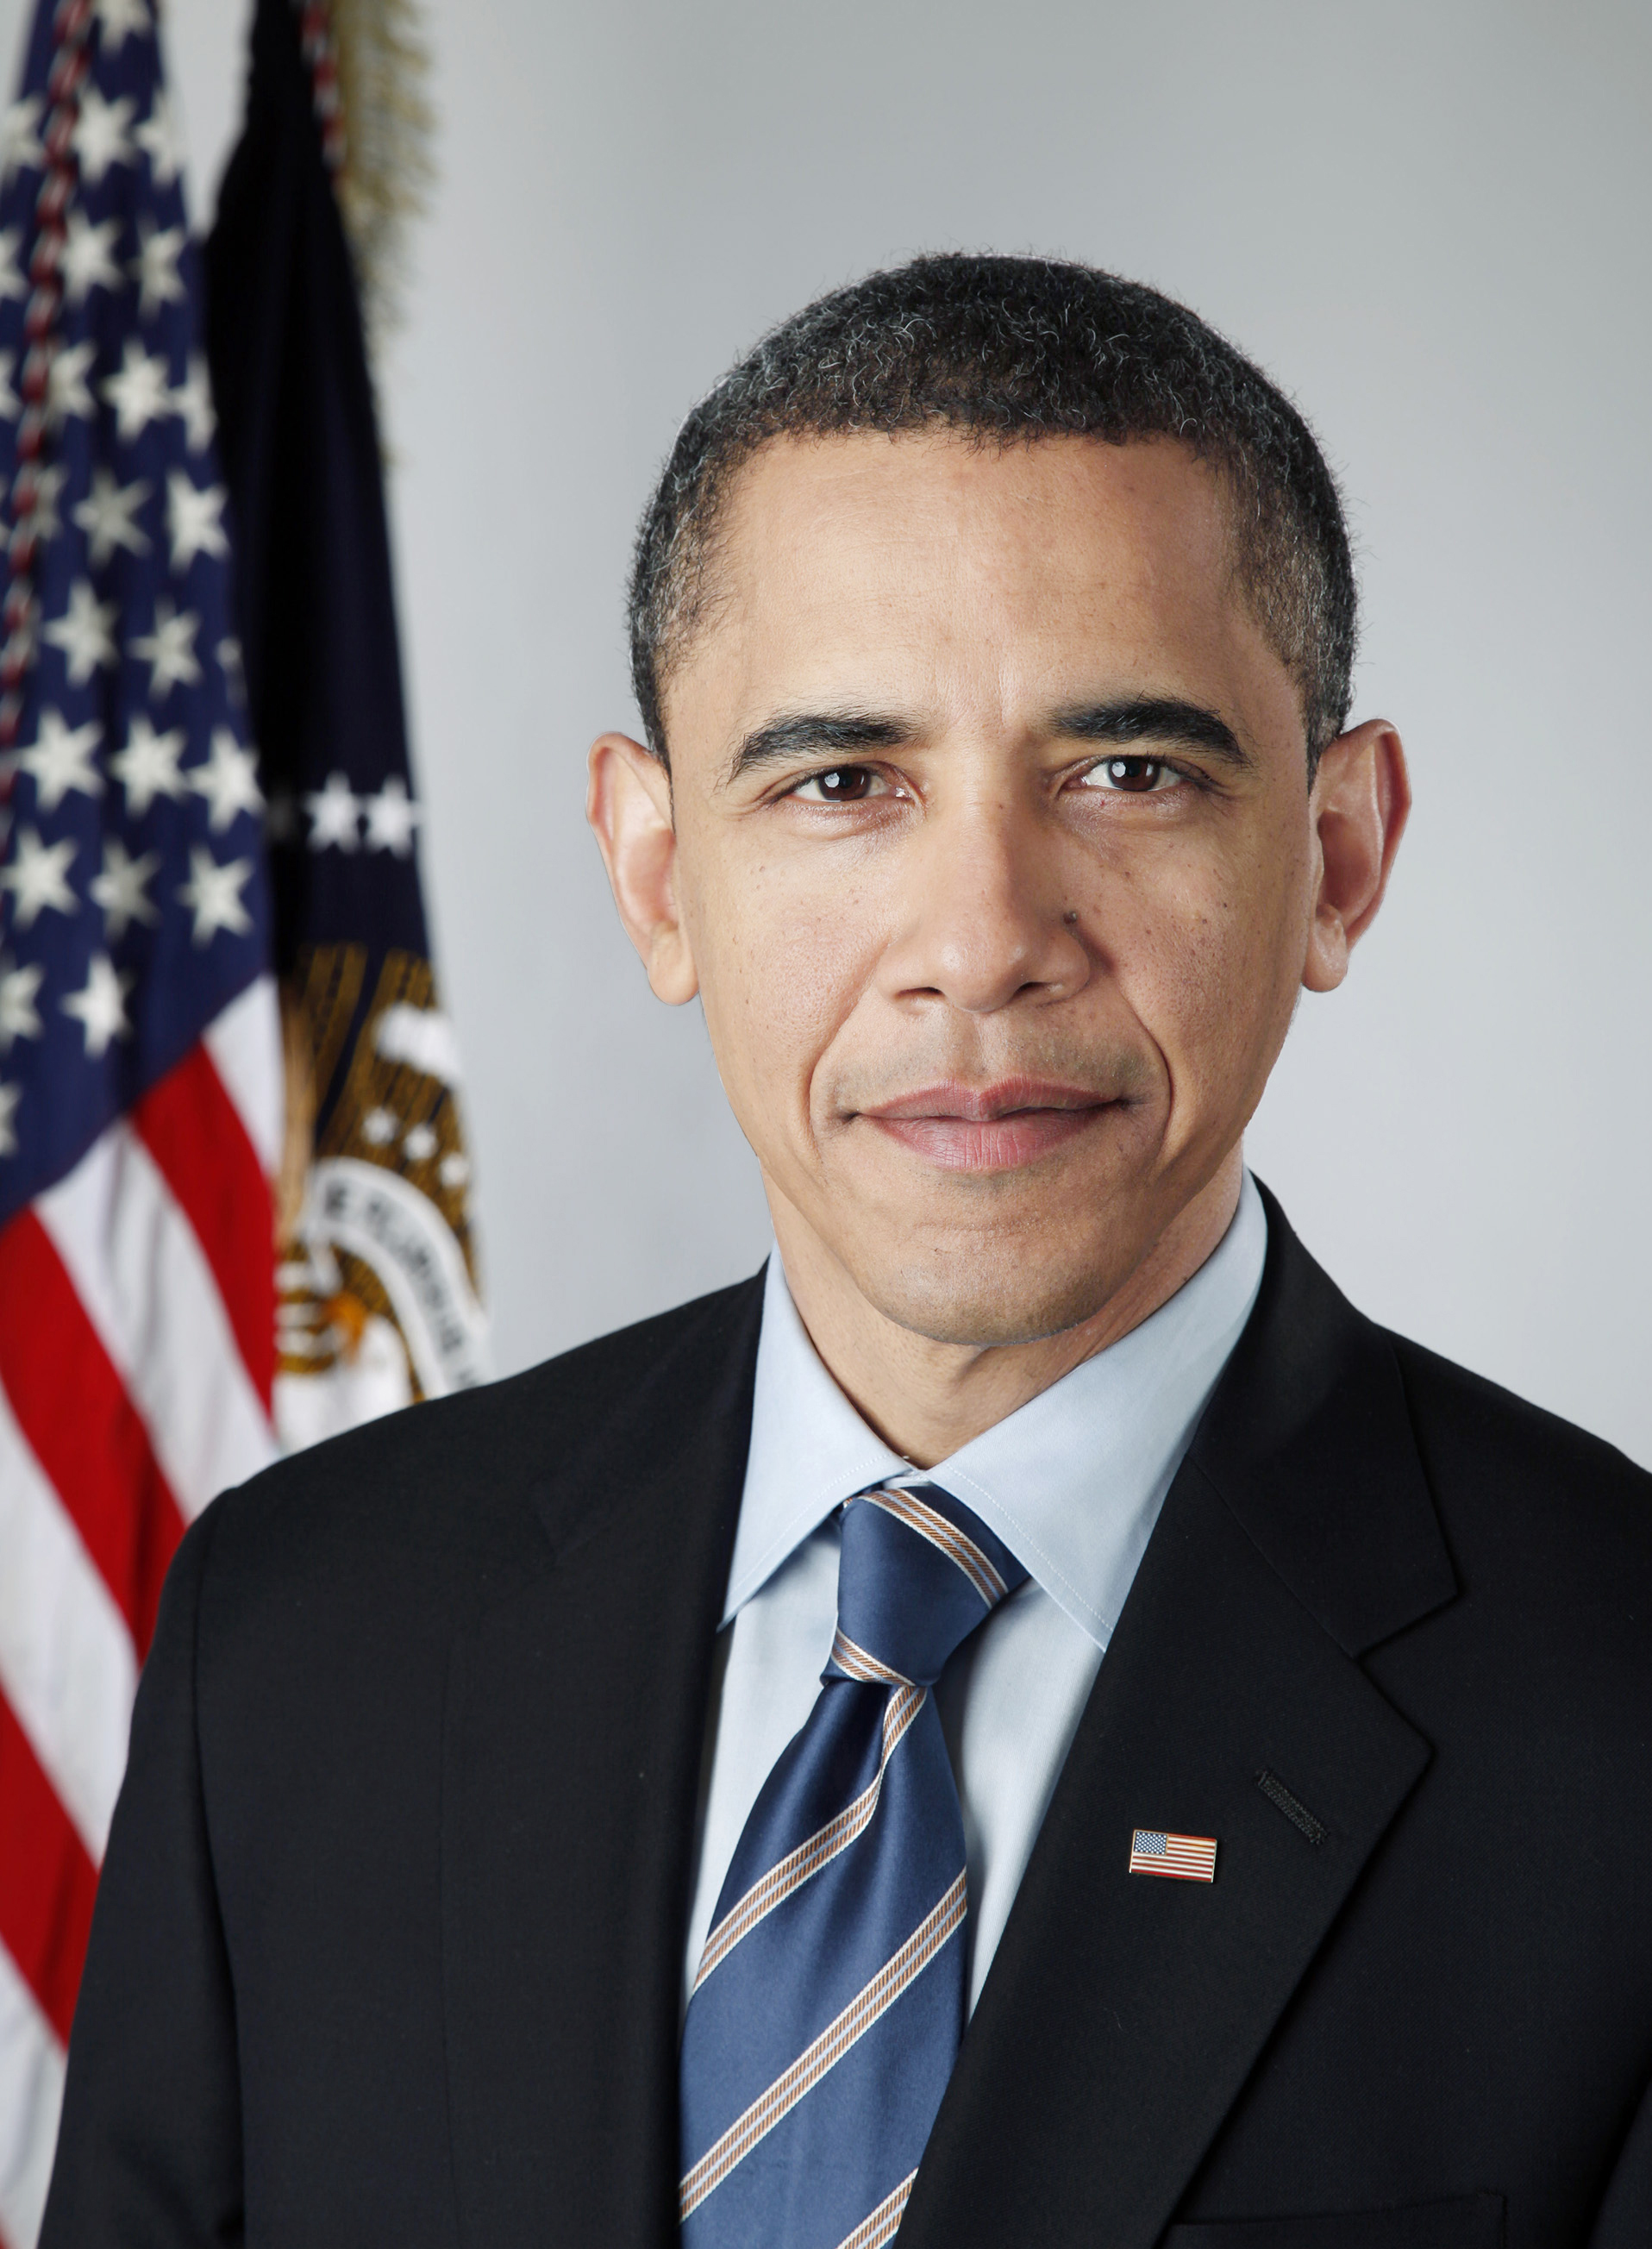 Obama 80 - Copy (2) - Copy.jpg